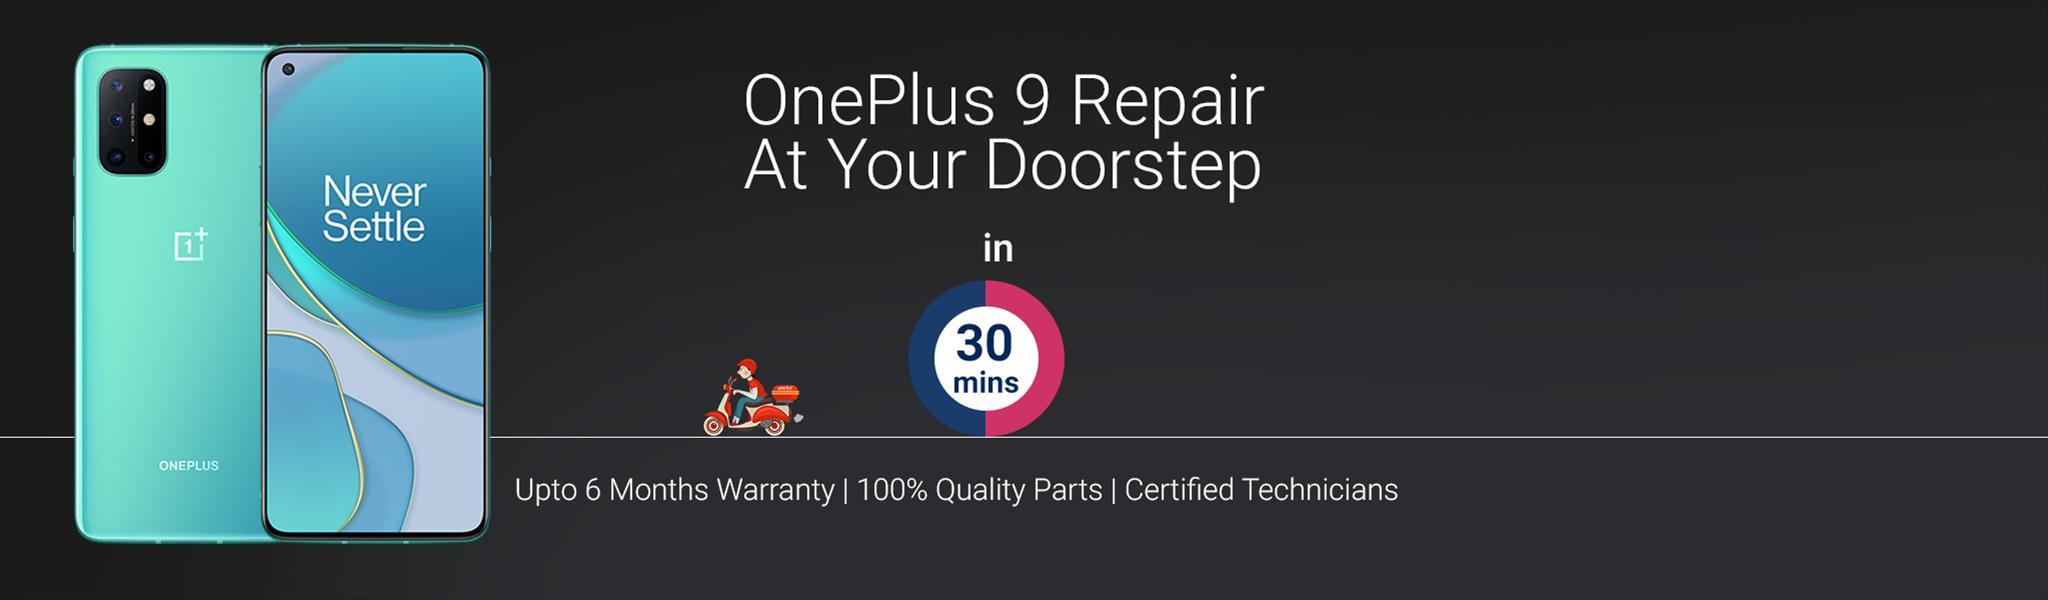 oneplus-9-repair.jpg